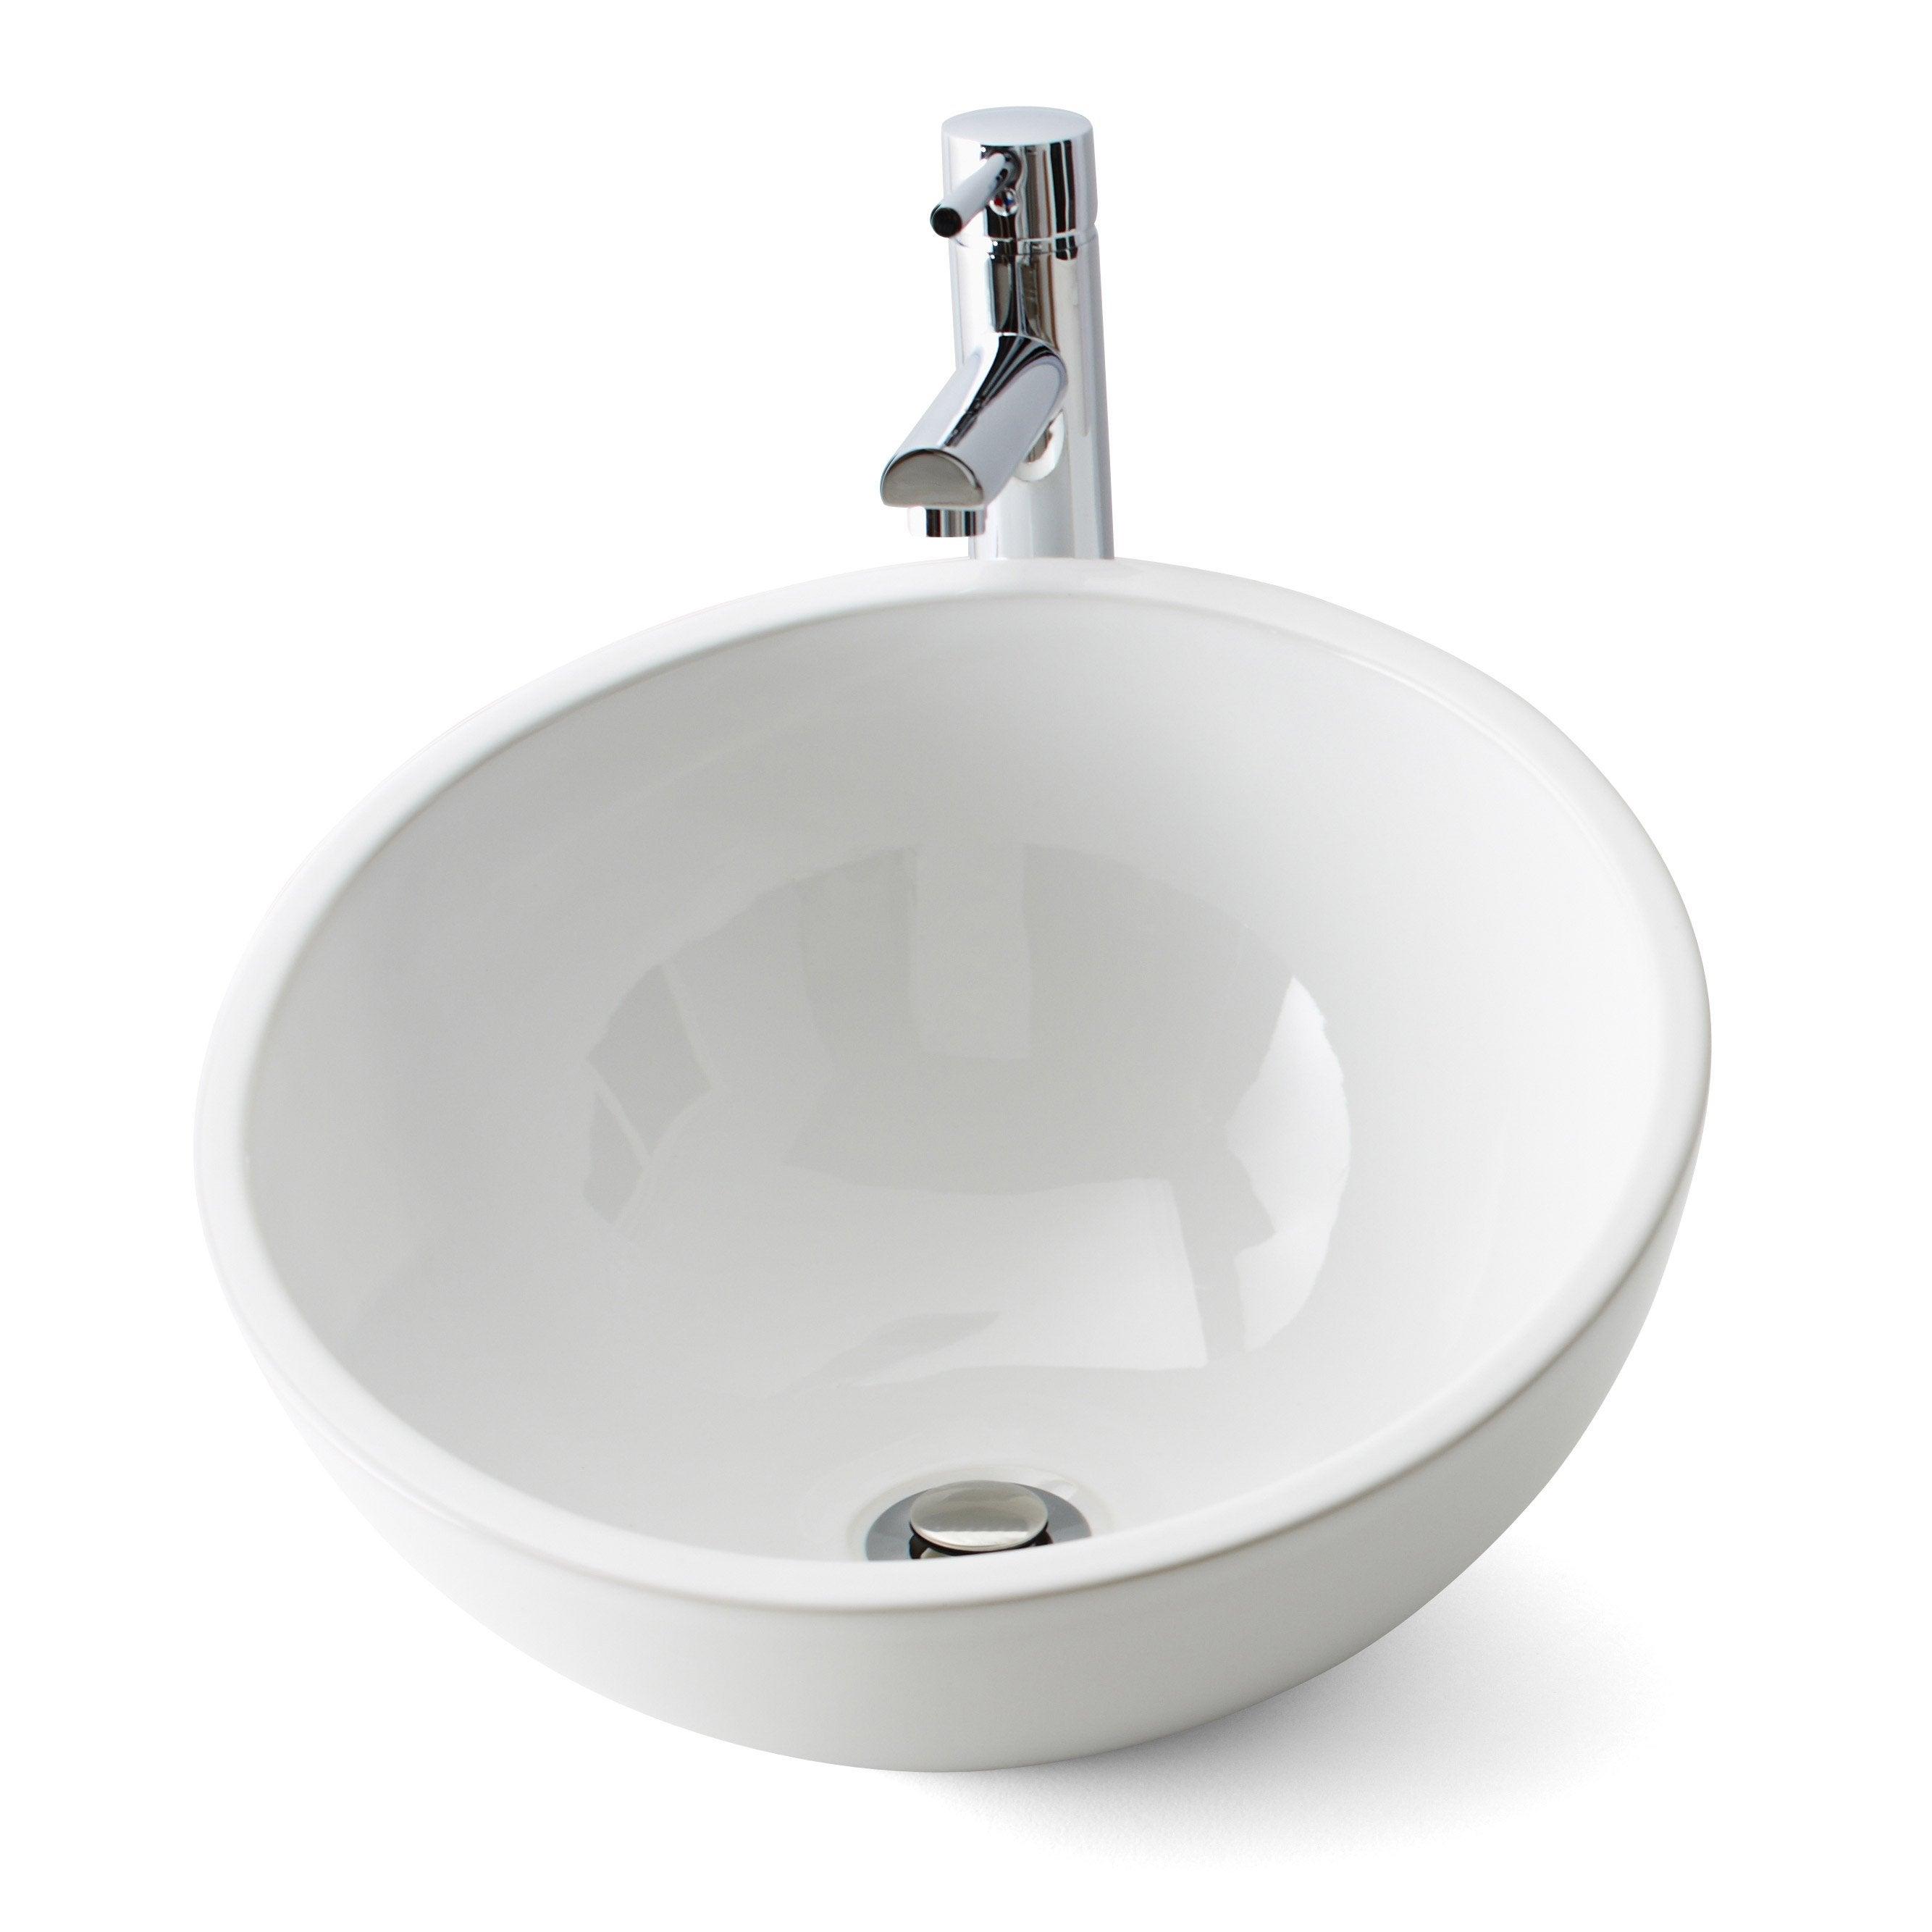 Vasque à poser céramique Diam.40 cm blanc Lounge